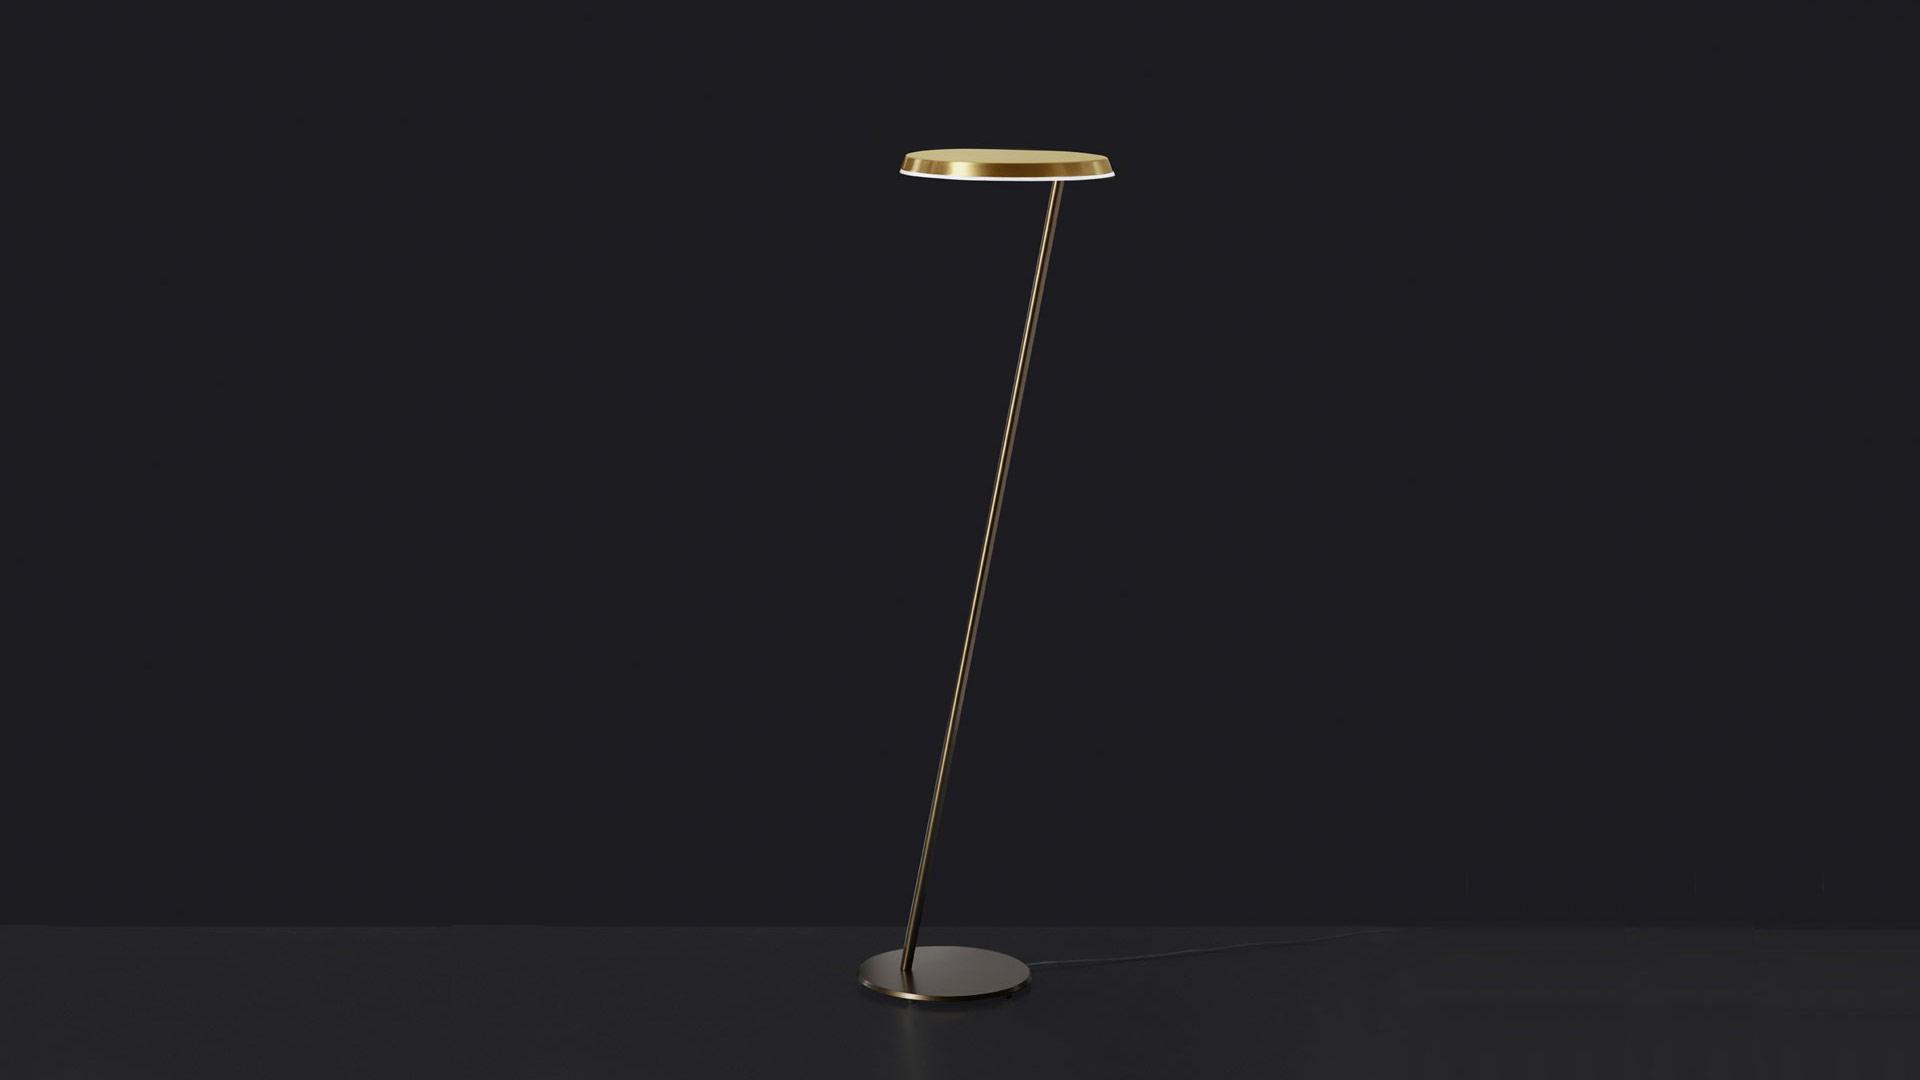 Amanita - 619 - design Mariana Pellegrino Soto